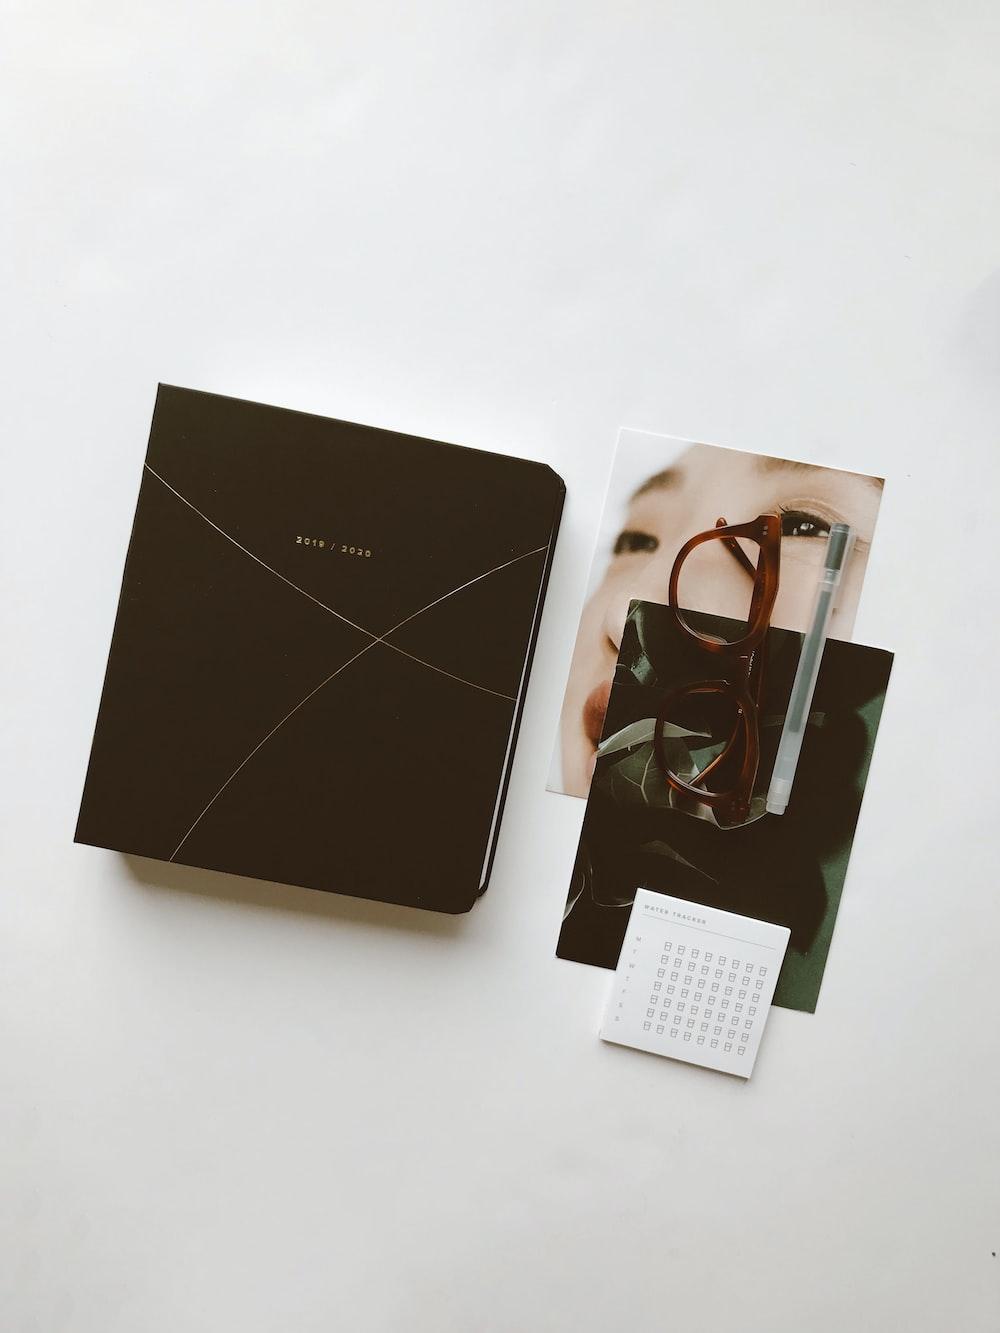 book beside eyeglasses on table